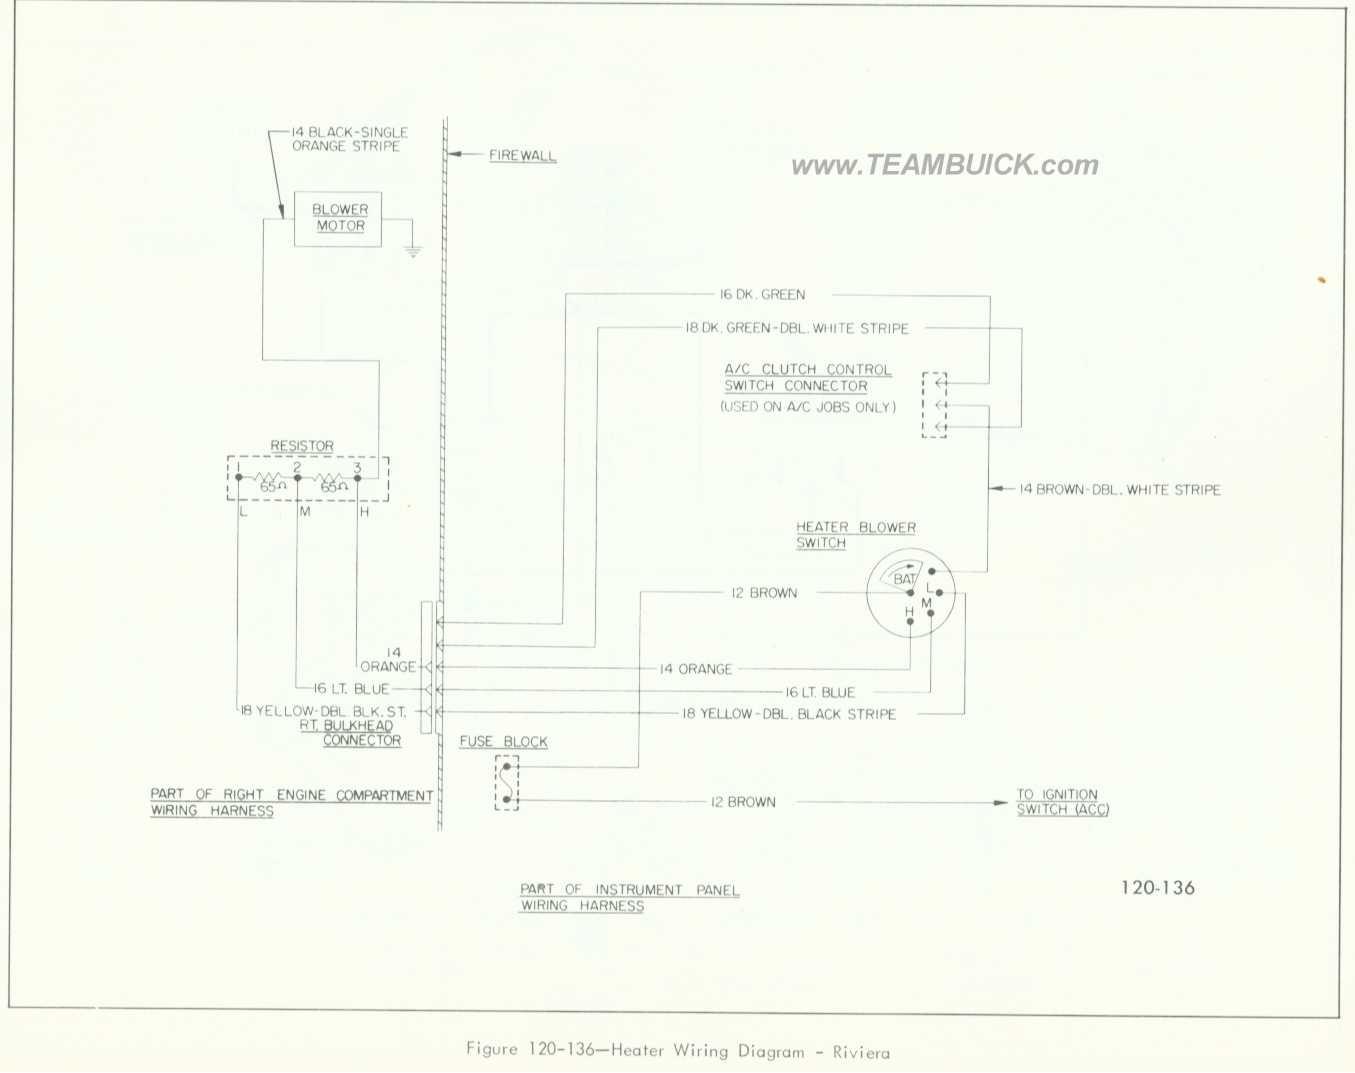 Buick Riviera Heater Wiring Diagram